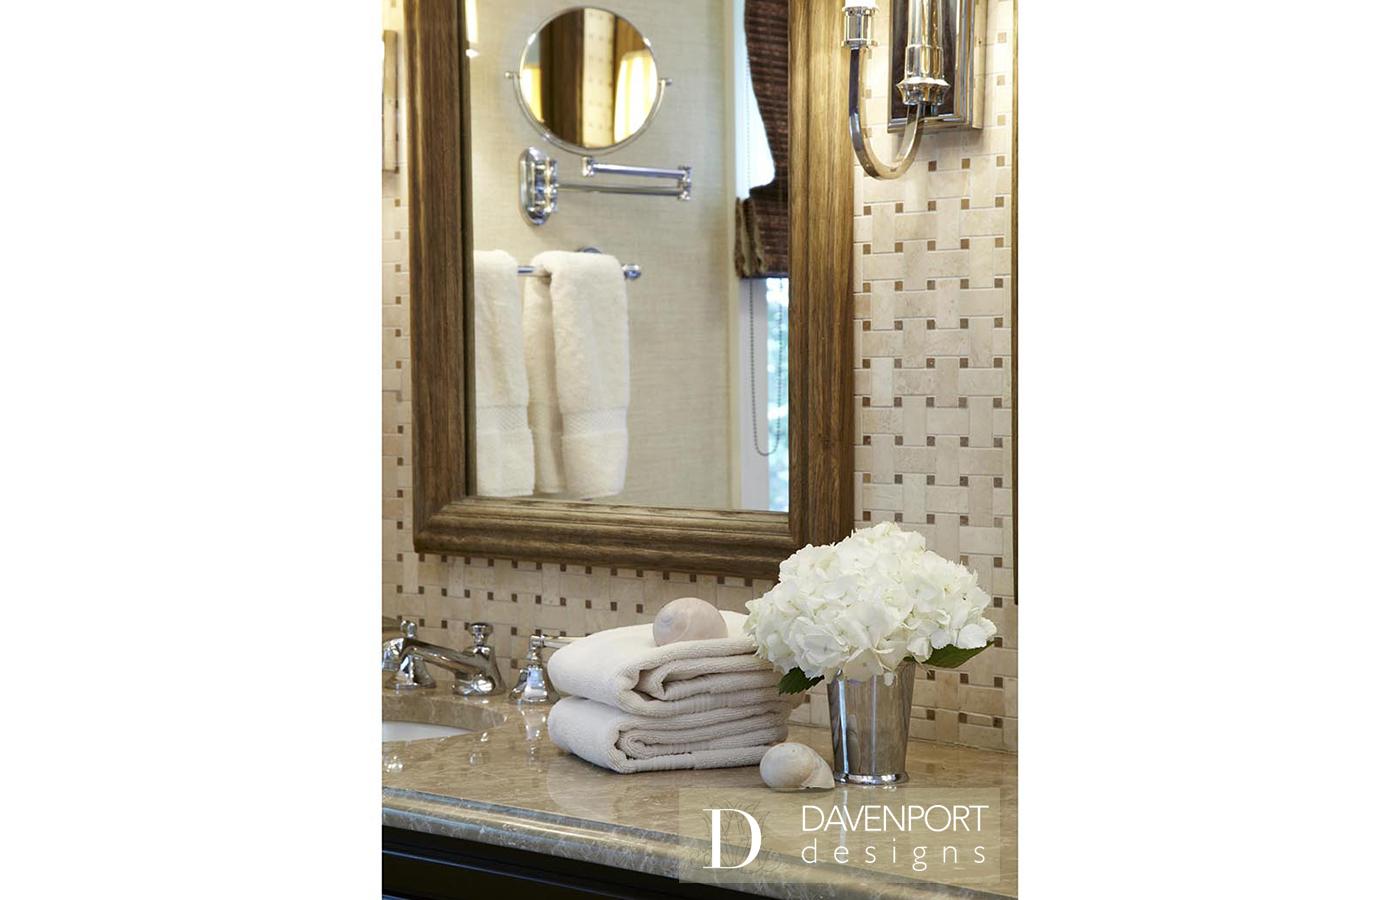 Davenport2012_Bathroom2.jpg